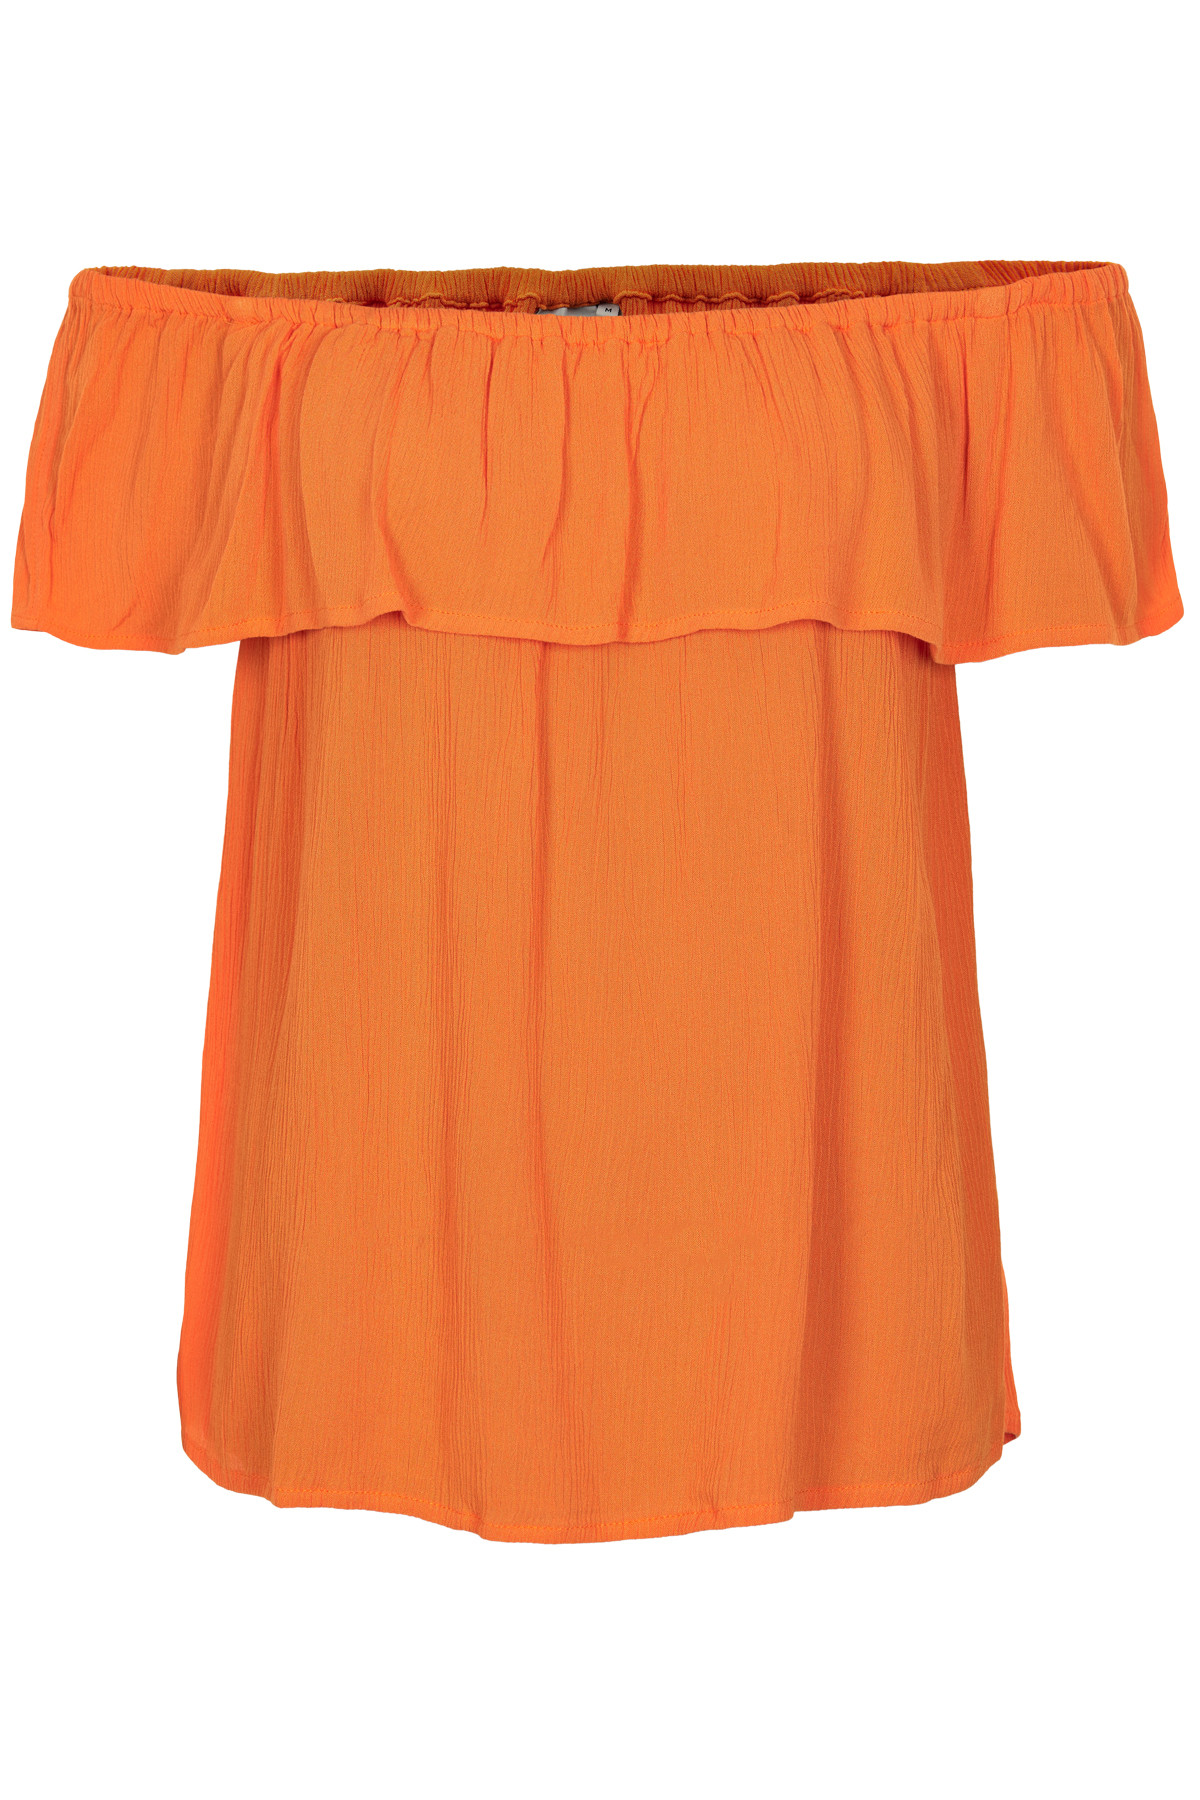 Image of   ICHI MARRAKECH TOP 20103351 17667 (Russet Orange 17667, L)